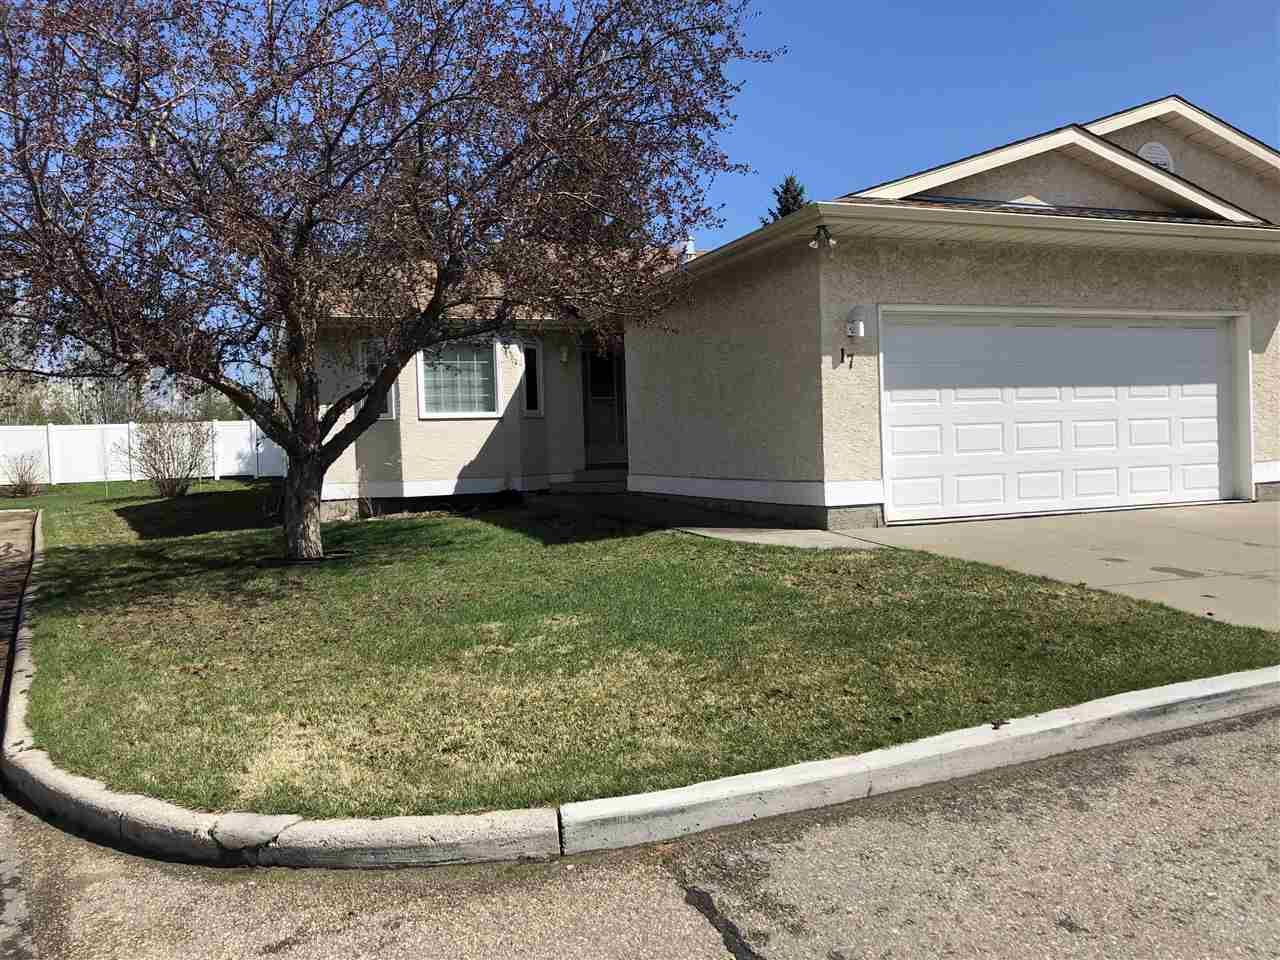 Main Photo: 17 9375 172 Street in Edmonton: Zone 20 Townhouse for sale : MLS®# E4208575